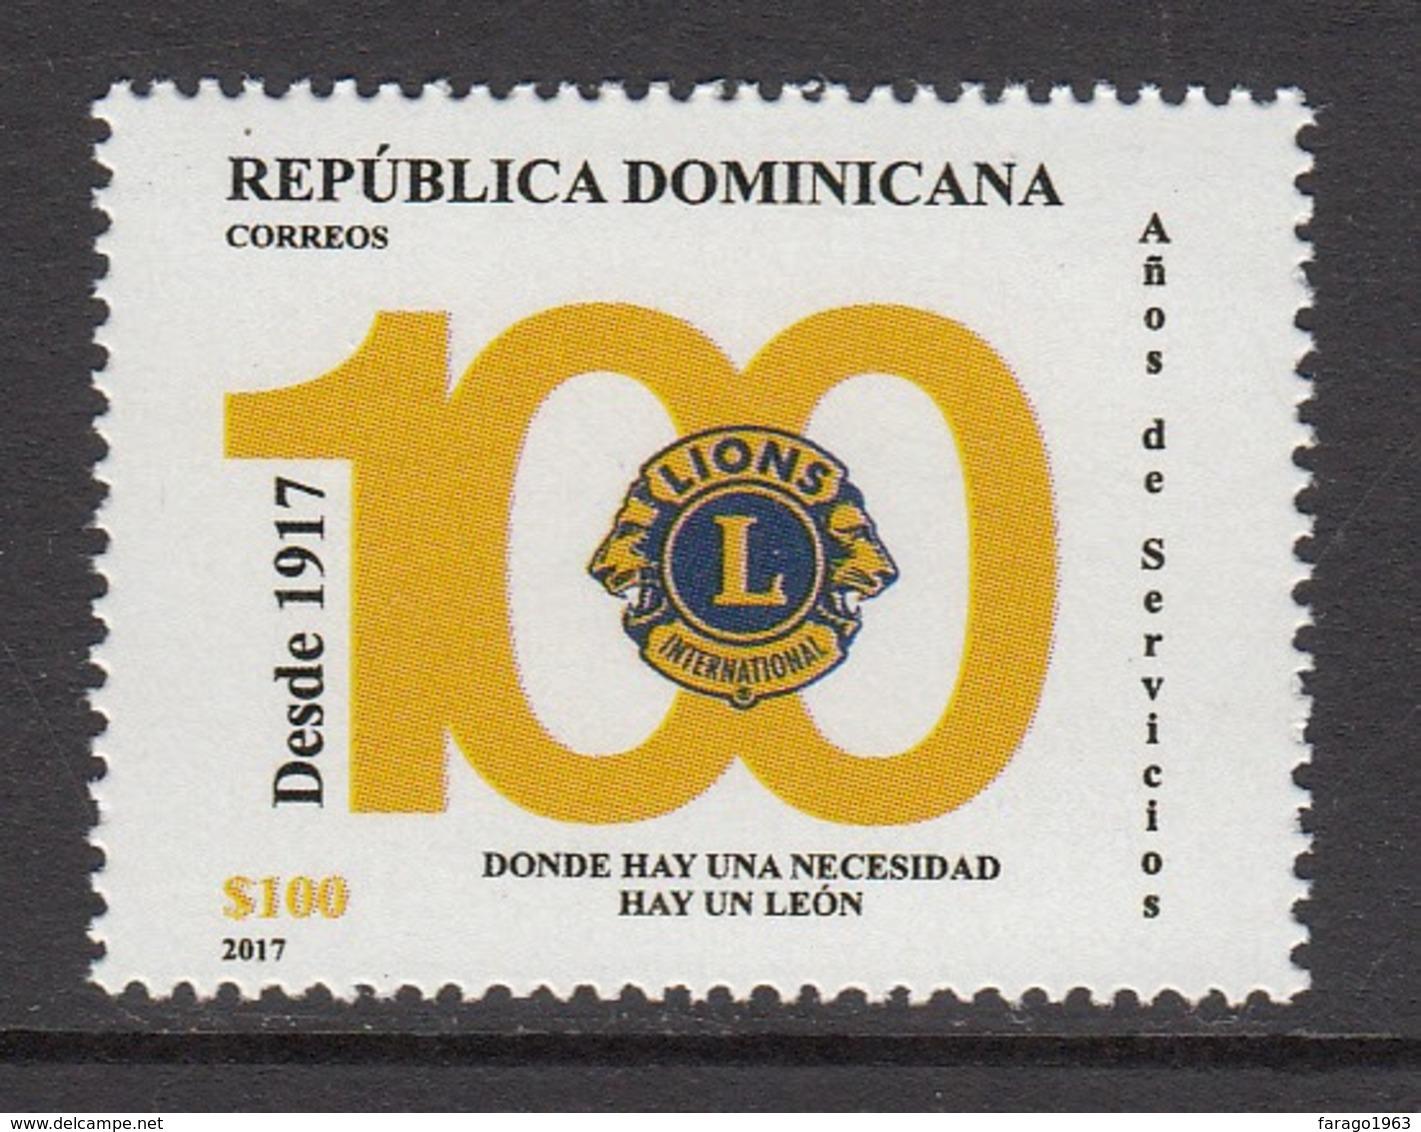 2017 Dominican Republic Dominicana Lions International Complete Set Of 1   MNH - Dominicaanse Republiek